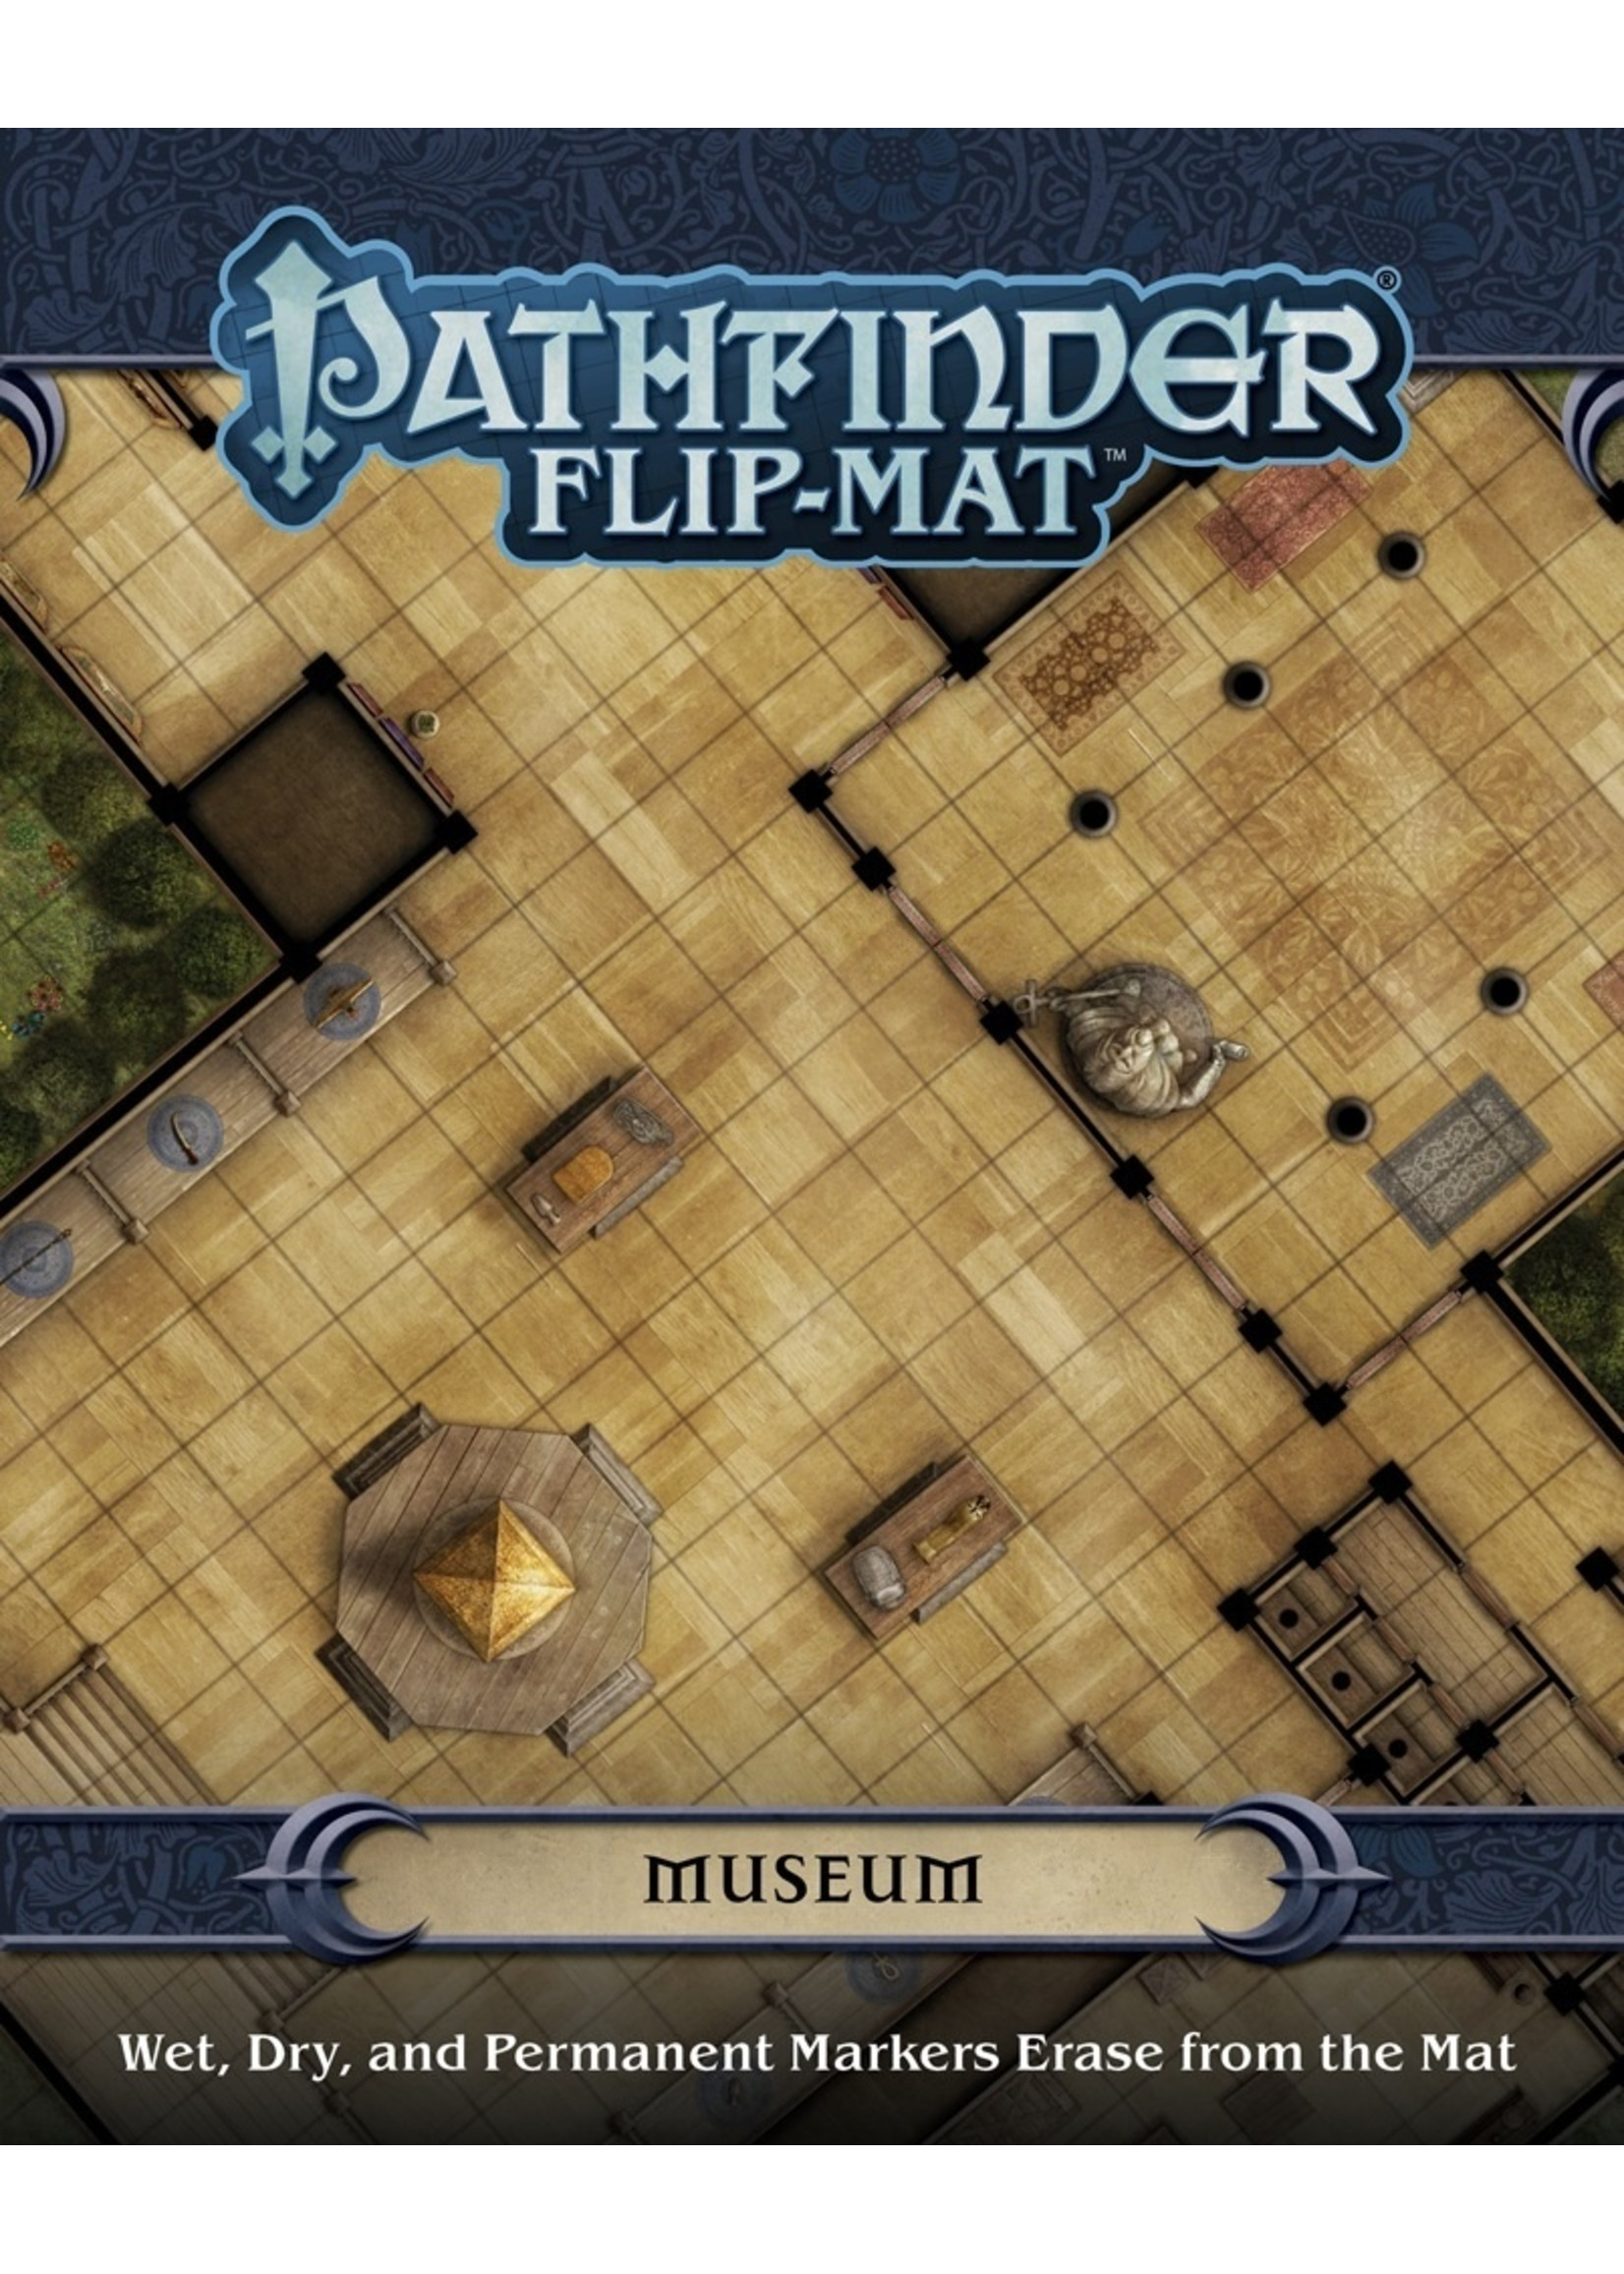 Pathfinder RPG: Flip-Mat - Museum